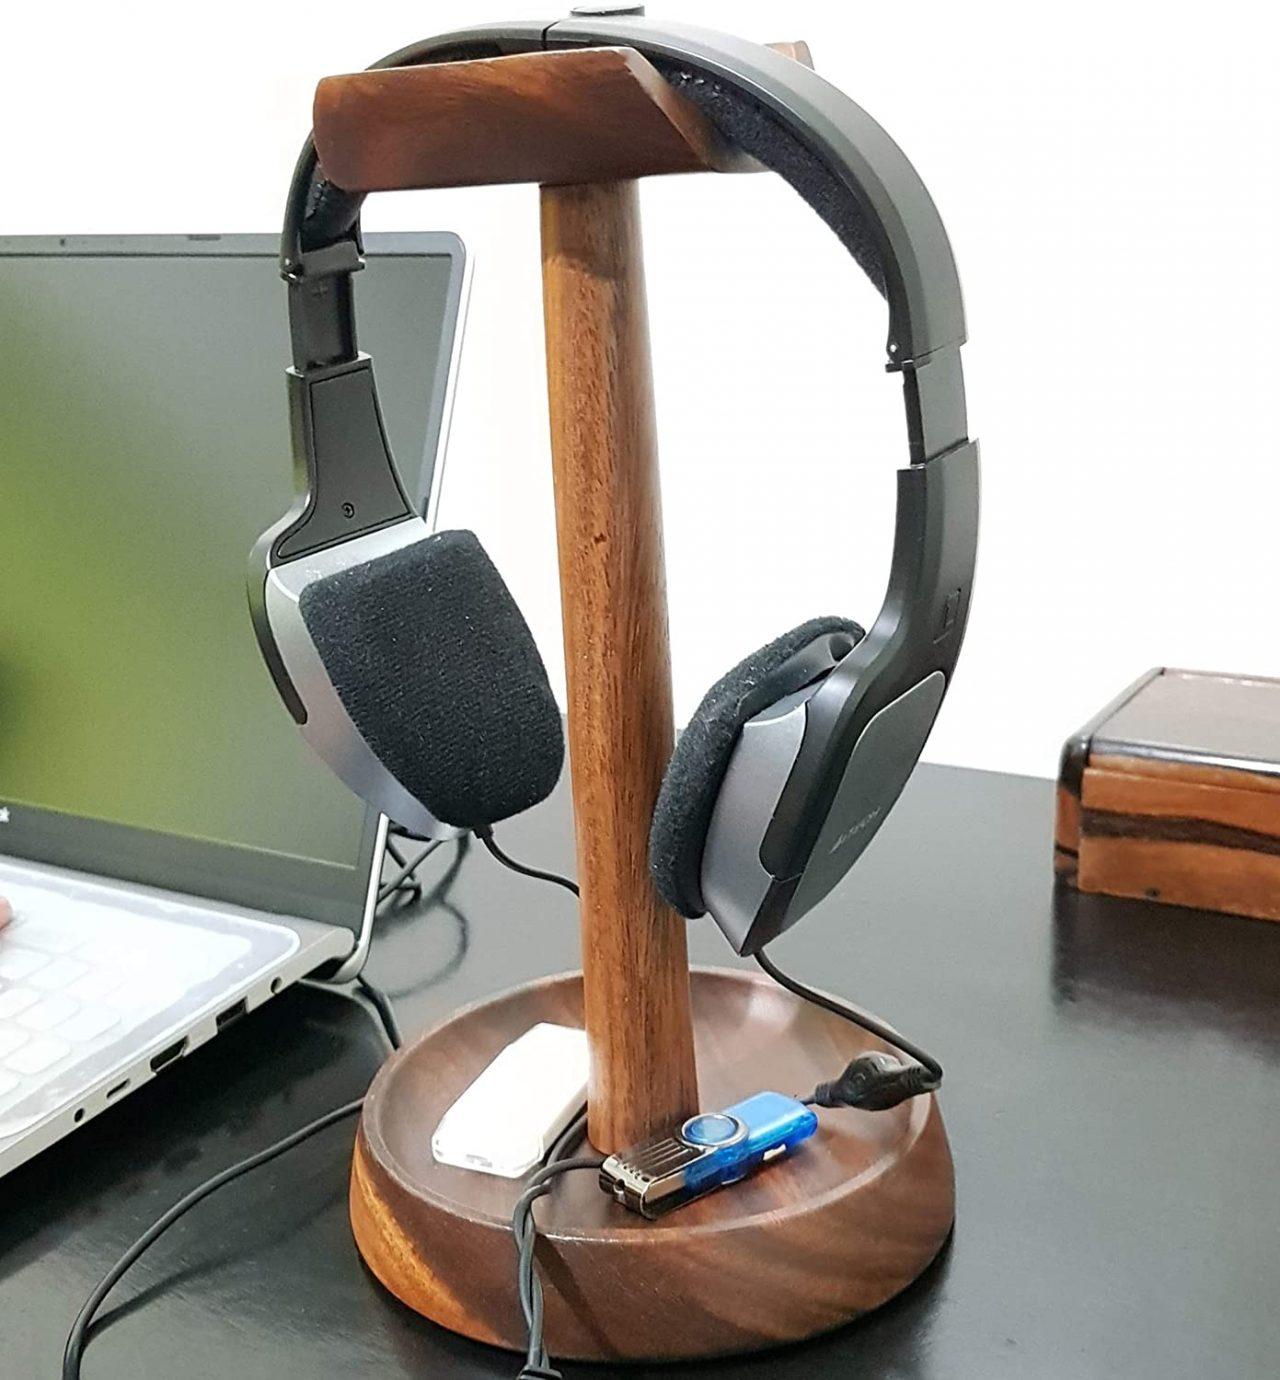 Wrightmart DIY Headphone Stand Holder